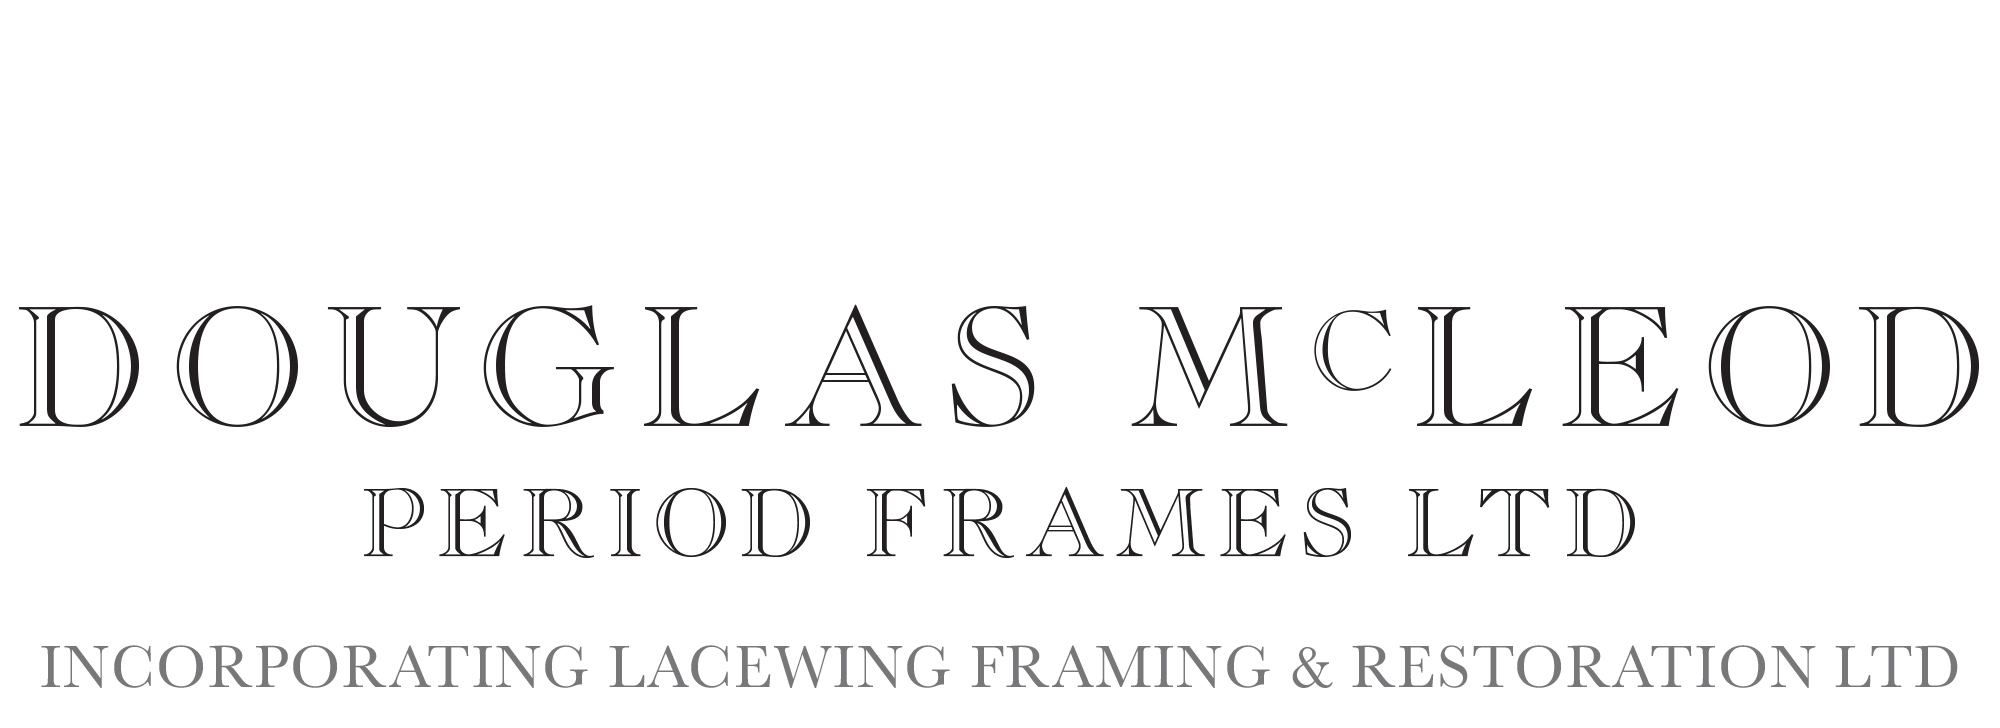 Douglas McLeod Period Frames